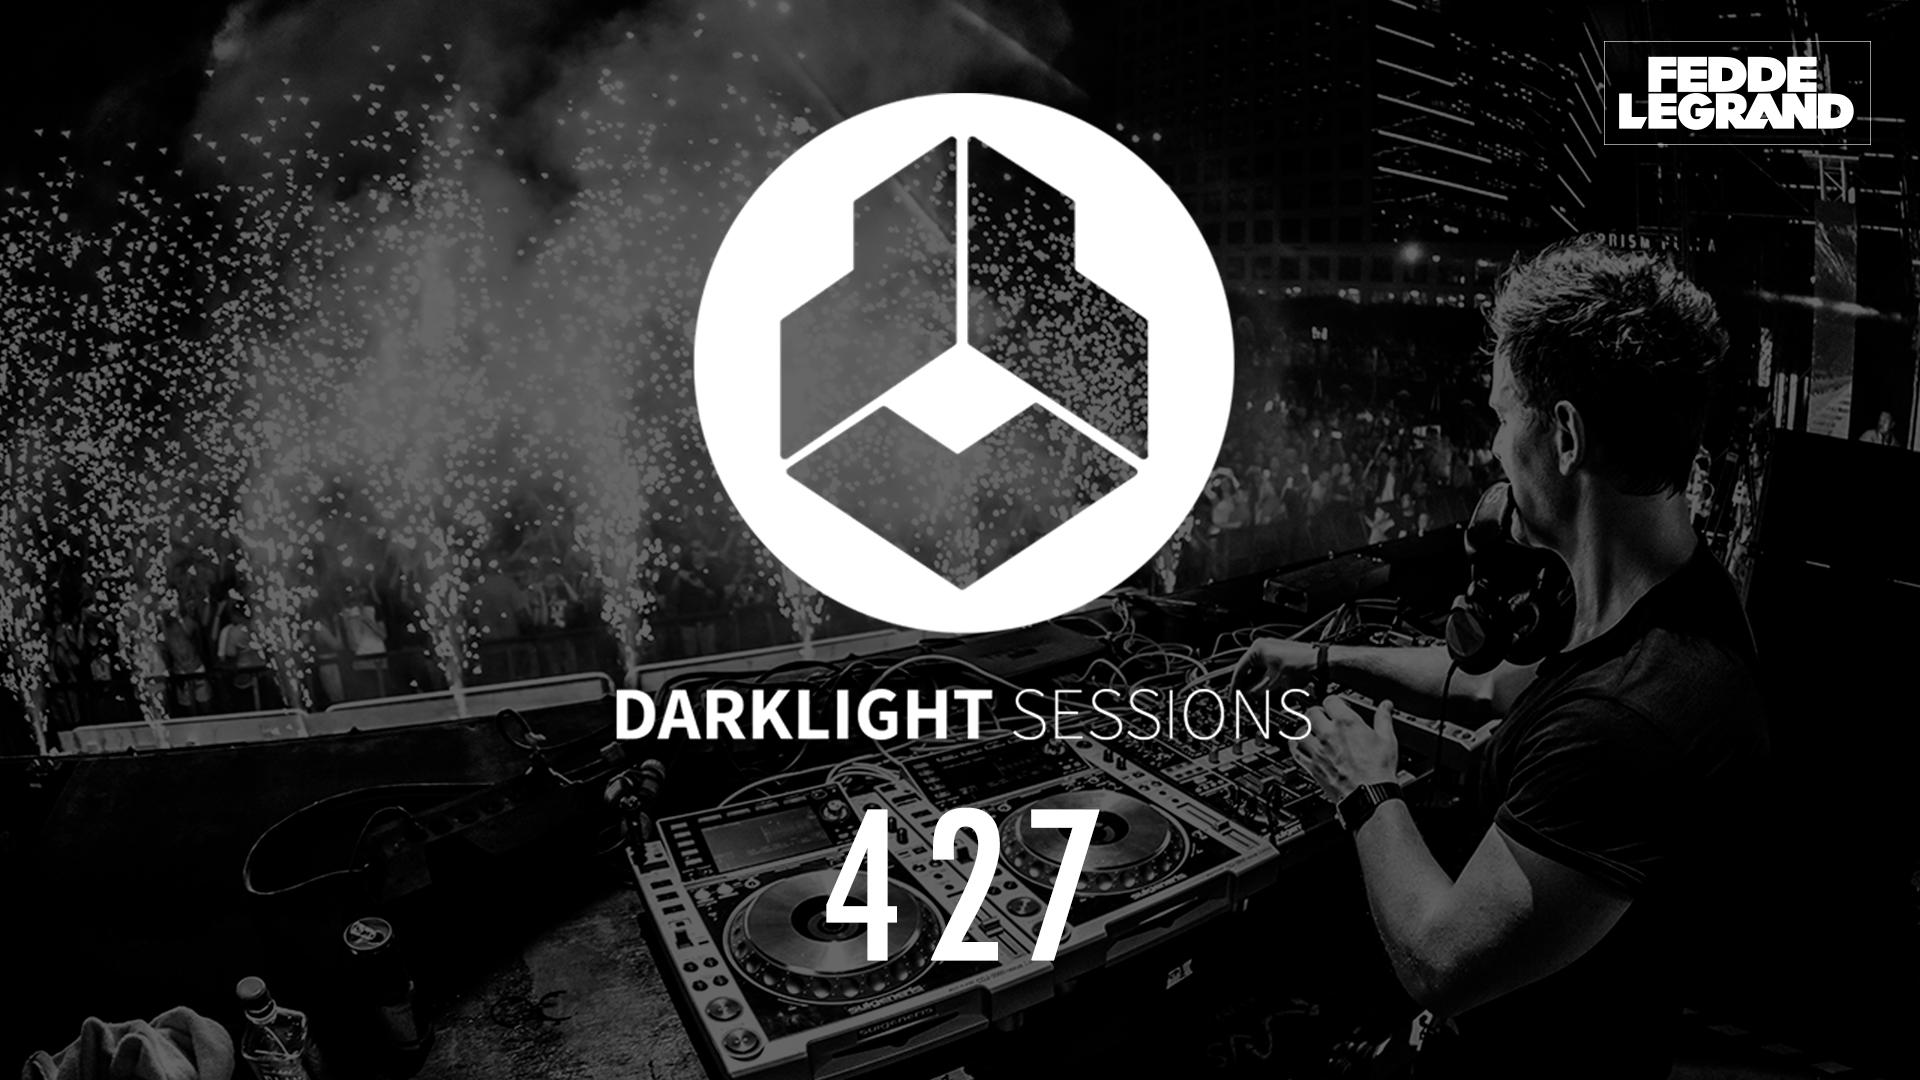 Darklight Sessions 427